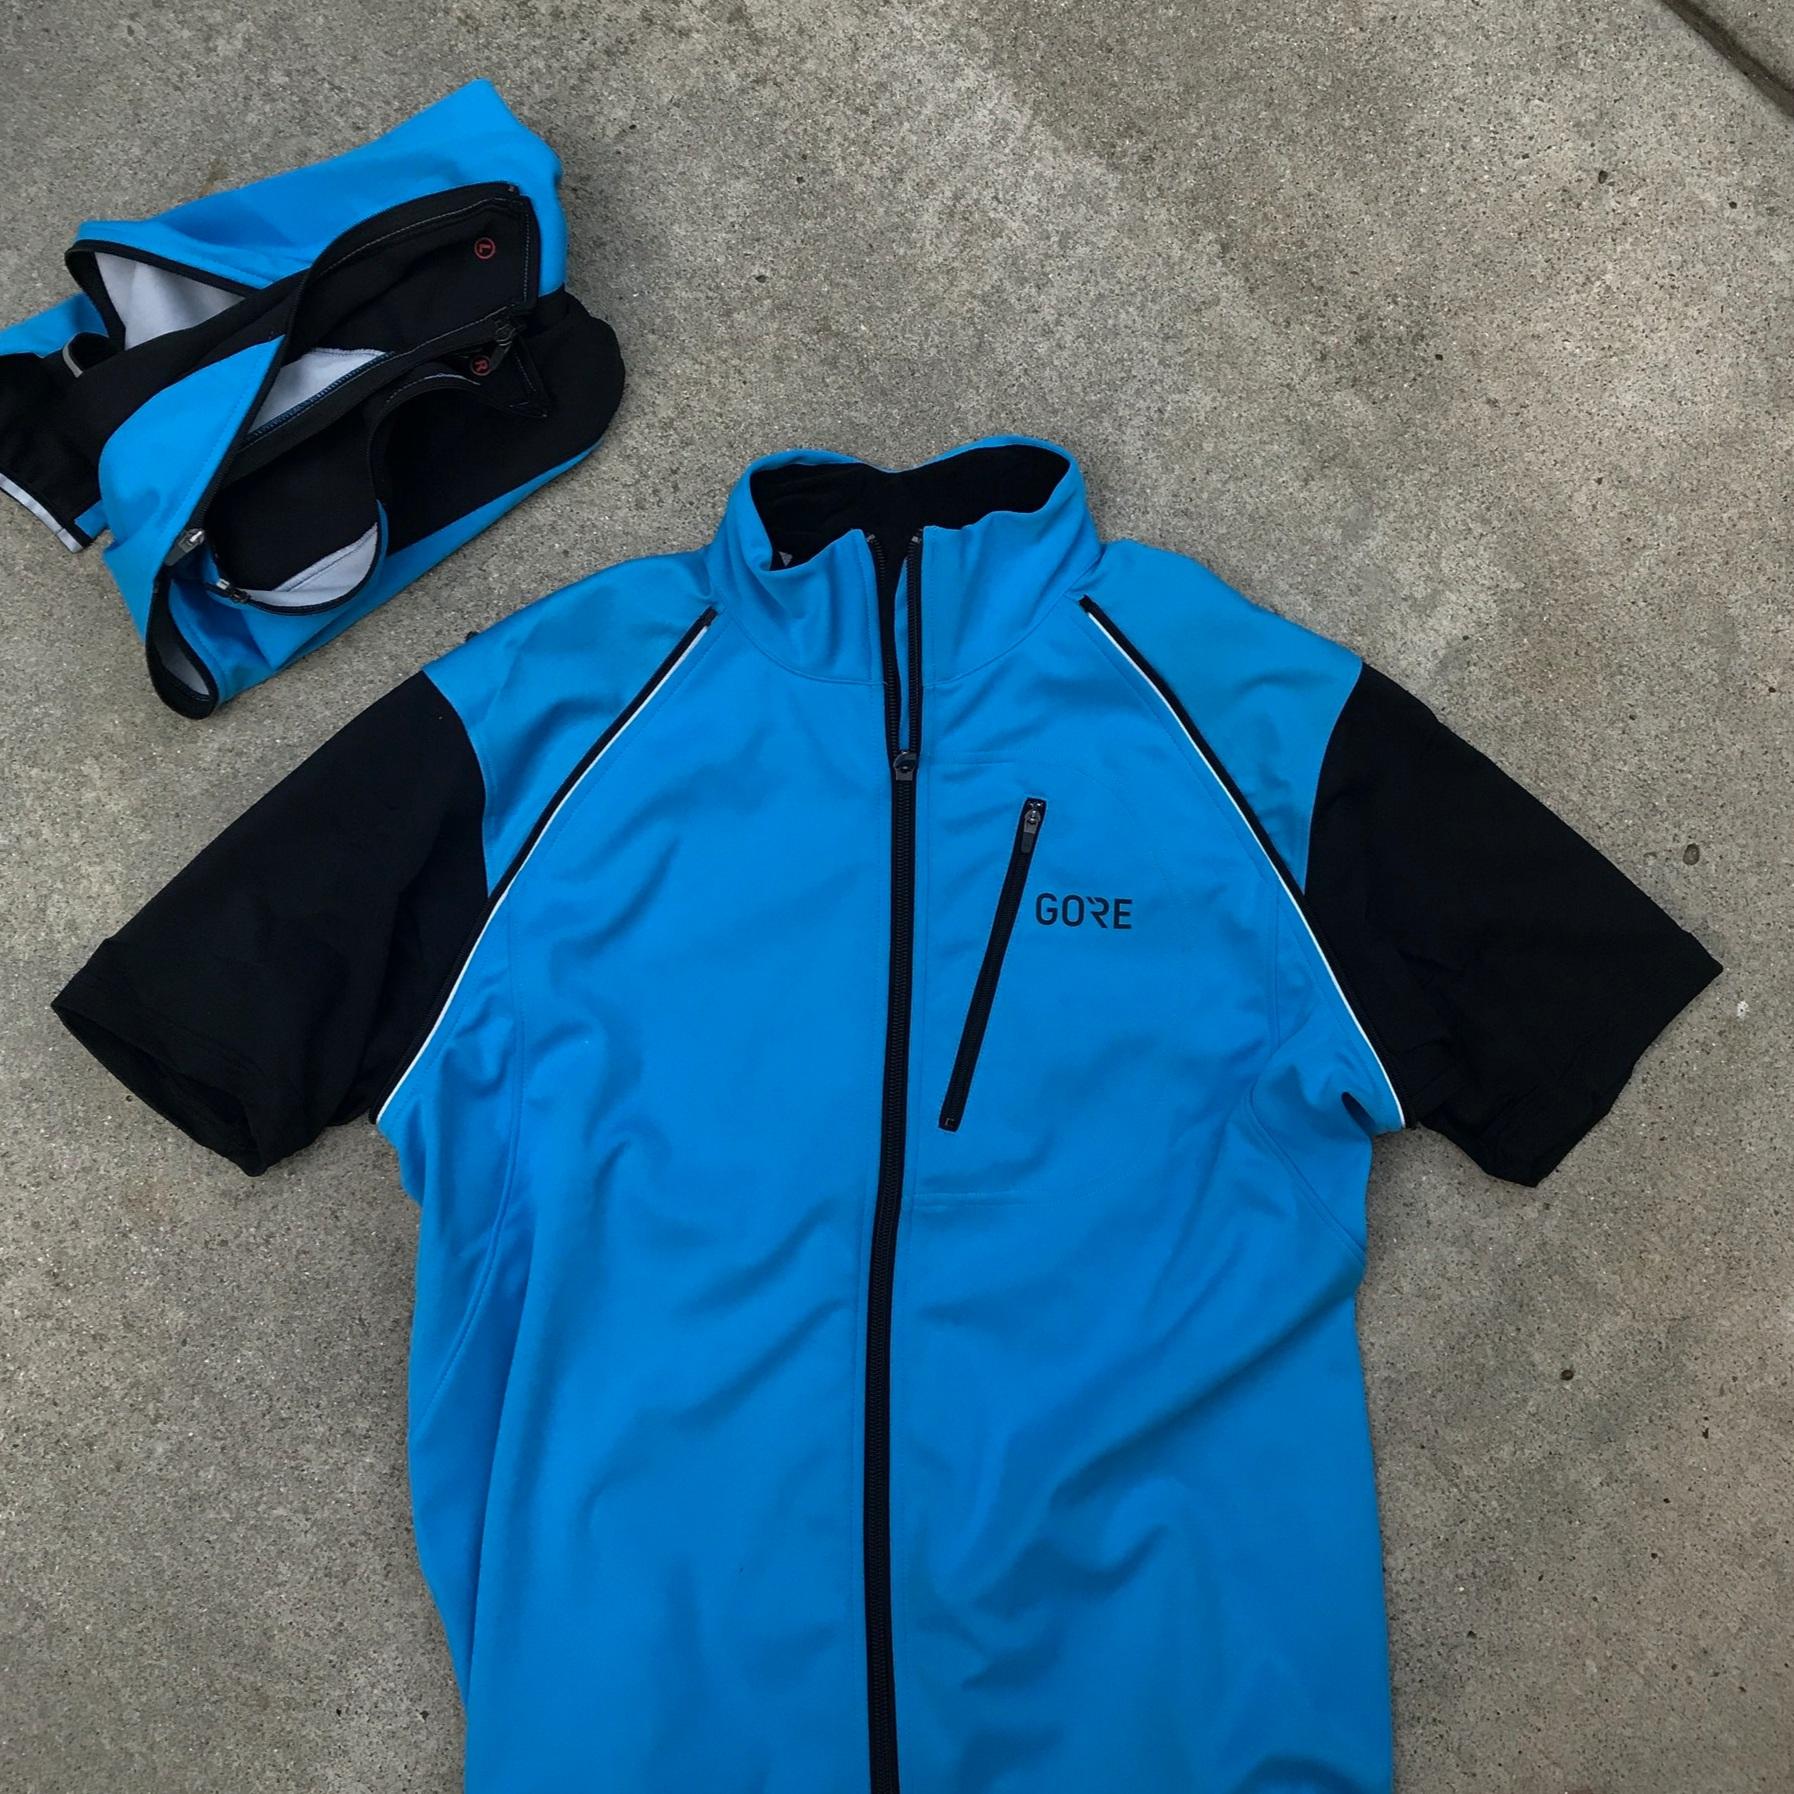 Gore Windstopper Jacket